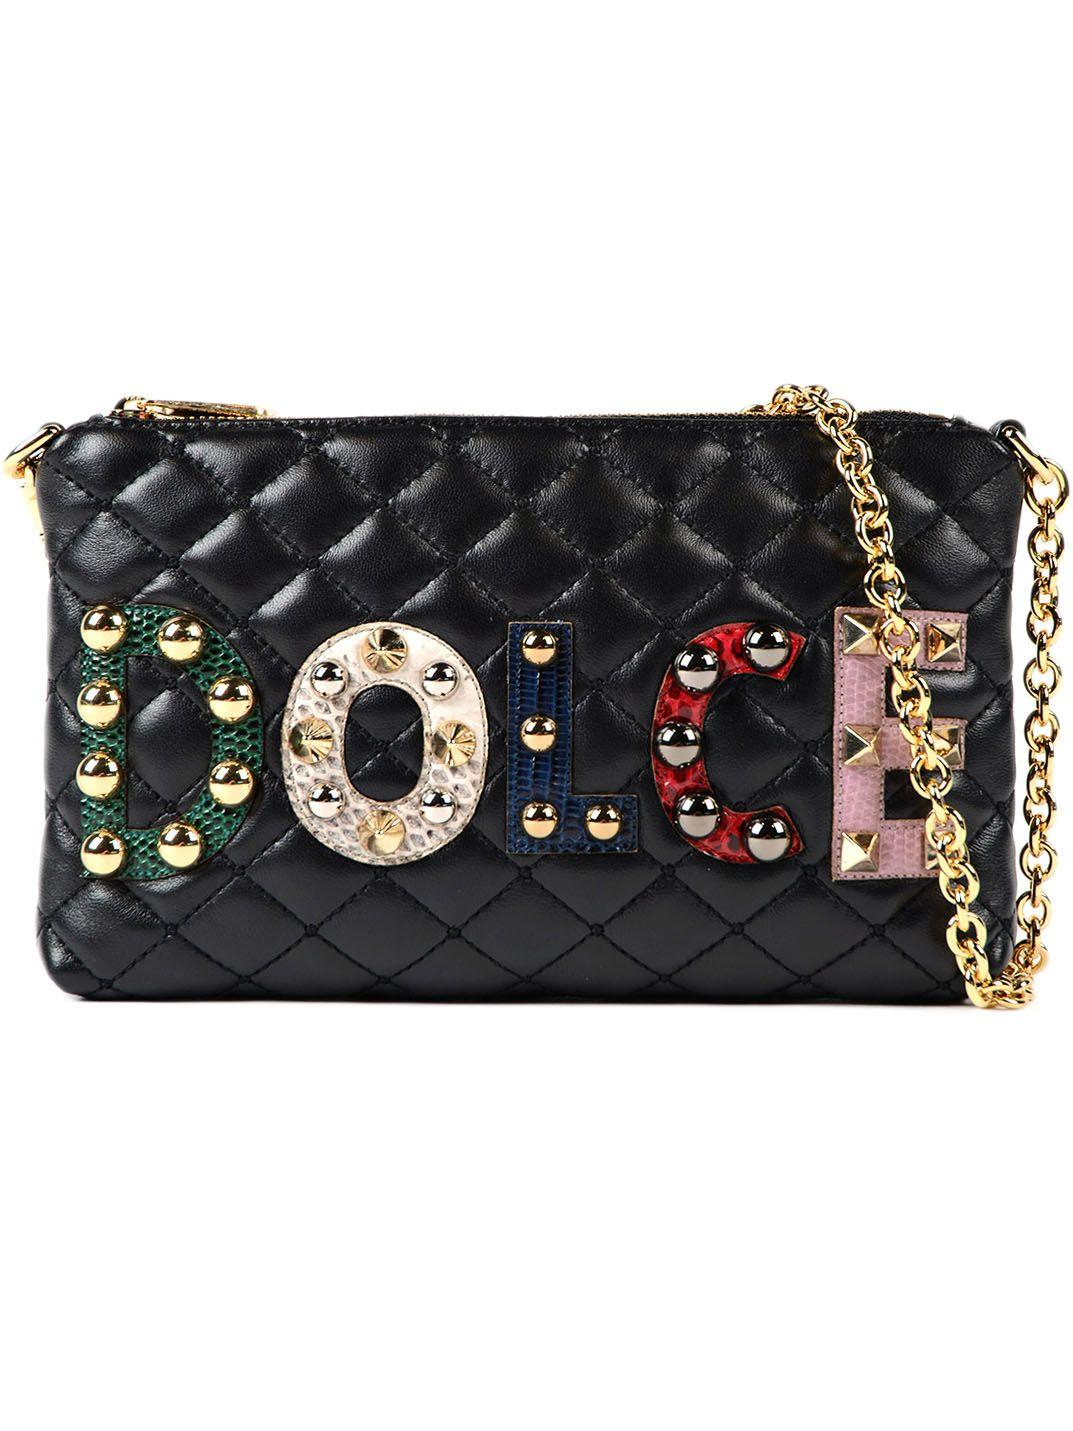 Dolce & Gabbana Dolce & Gabbana Applique Logo Quilted Wallet